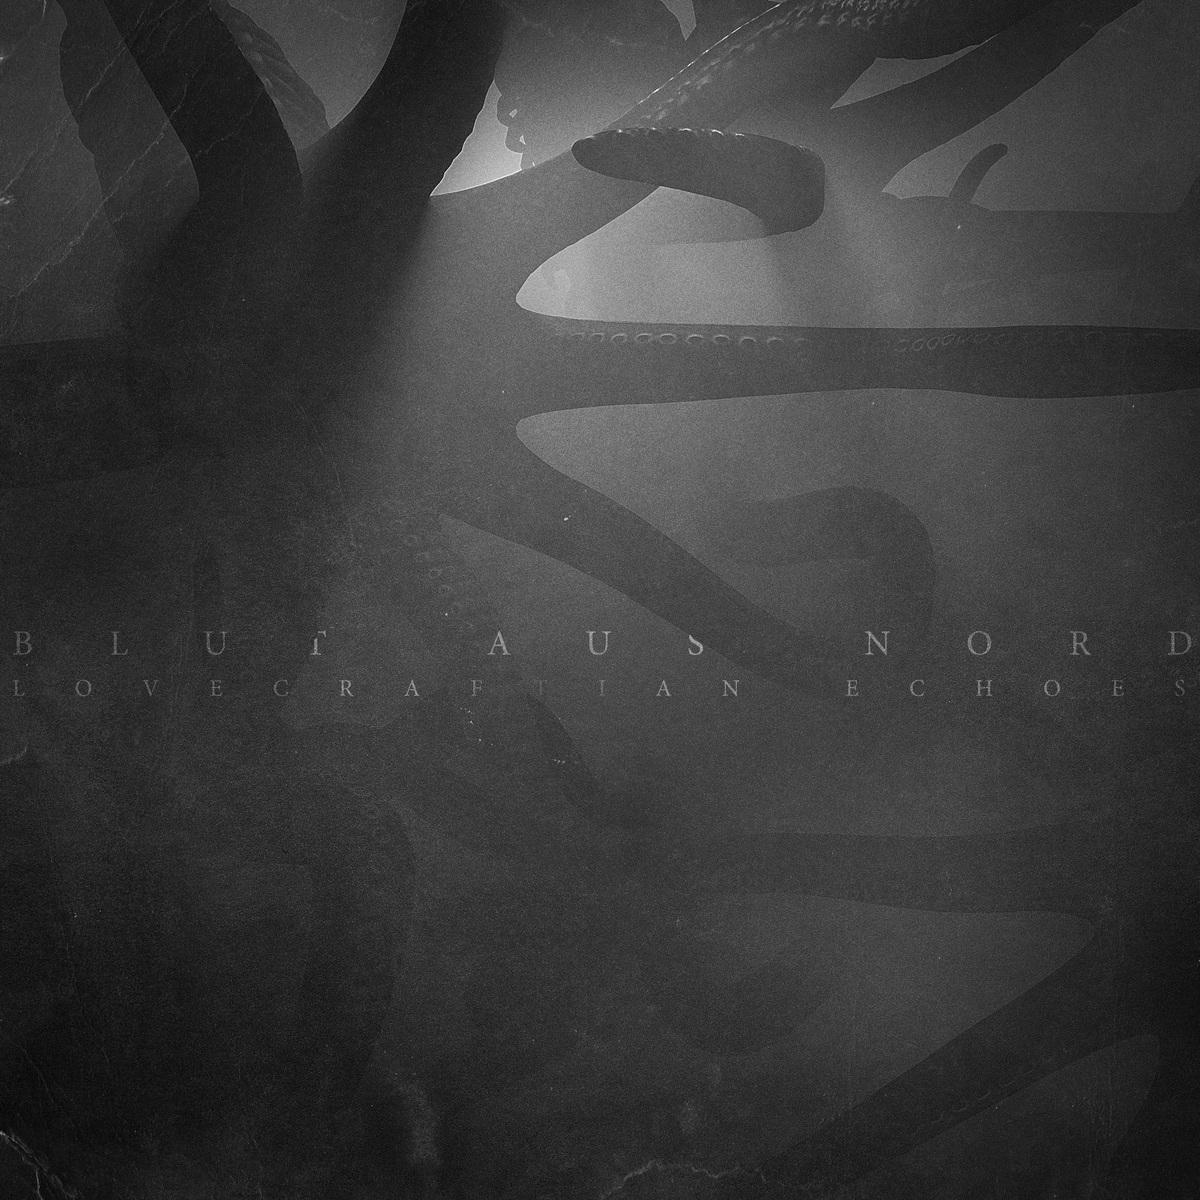 DEHN SORA - Blut Aus Nord Lovecraftian Echoes 2019